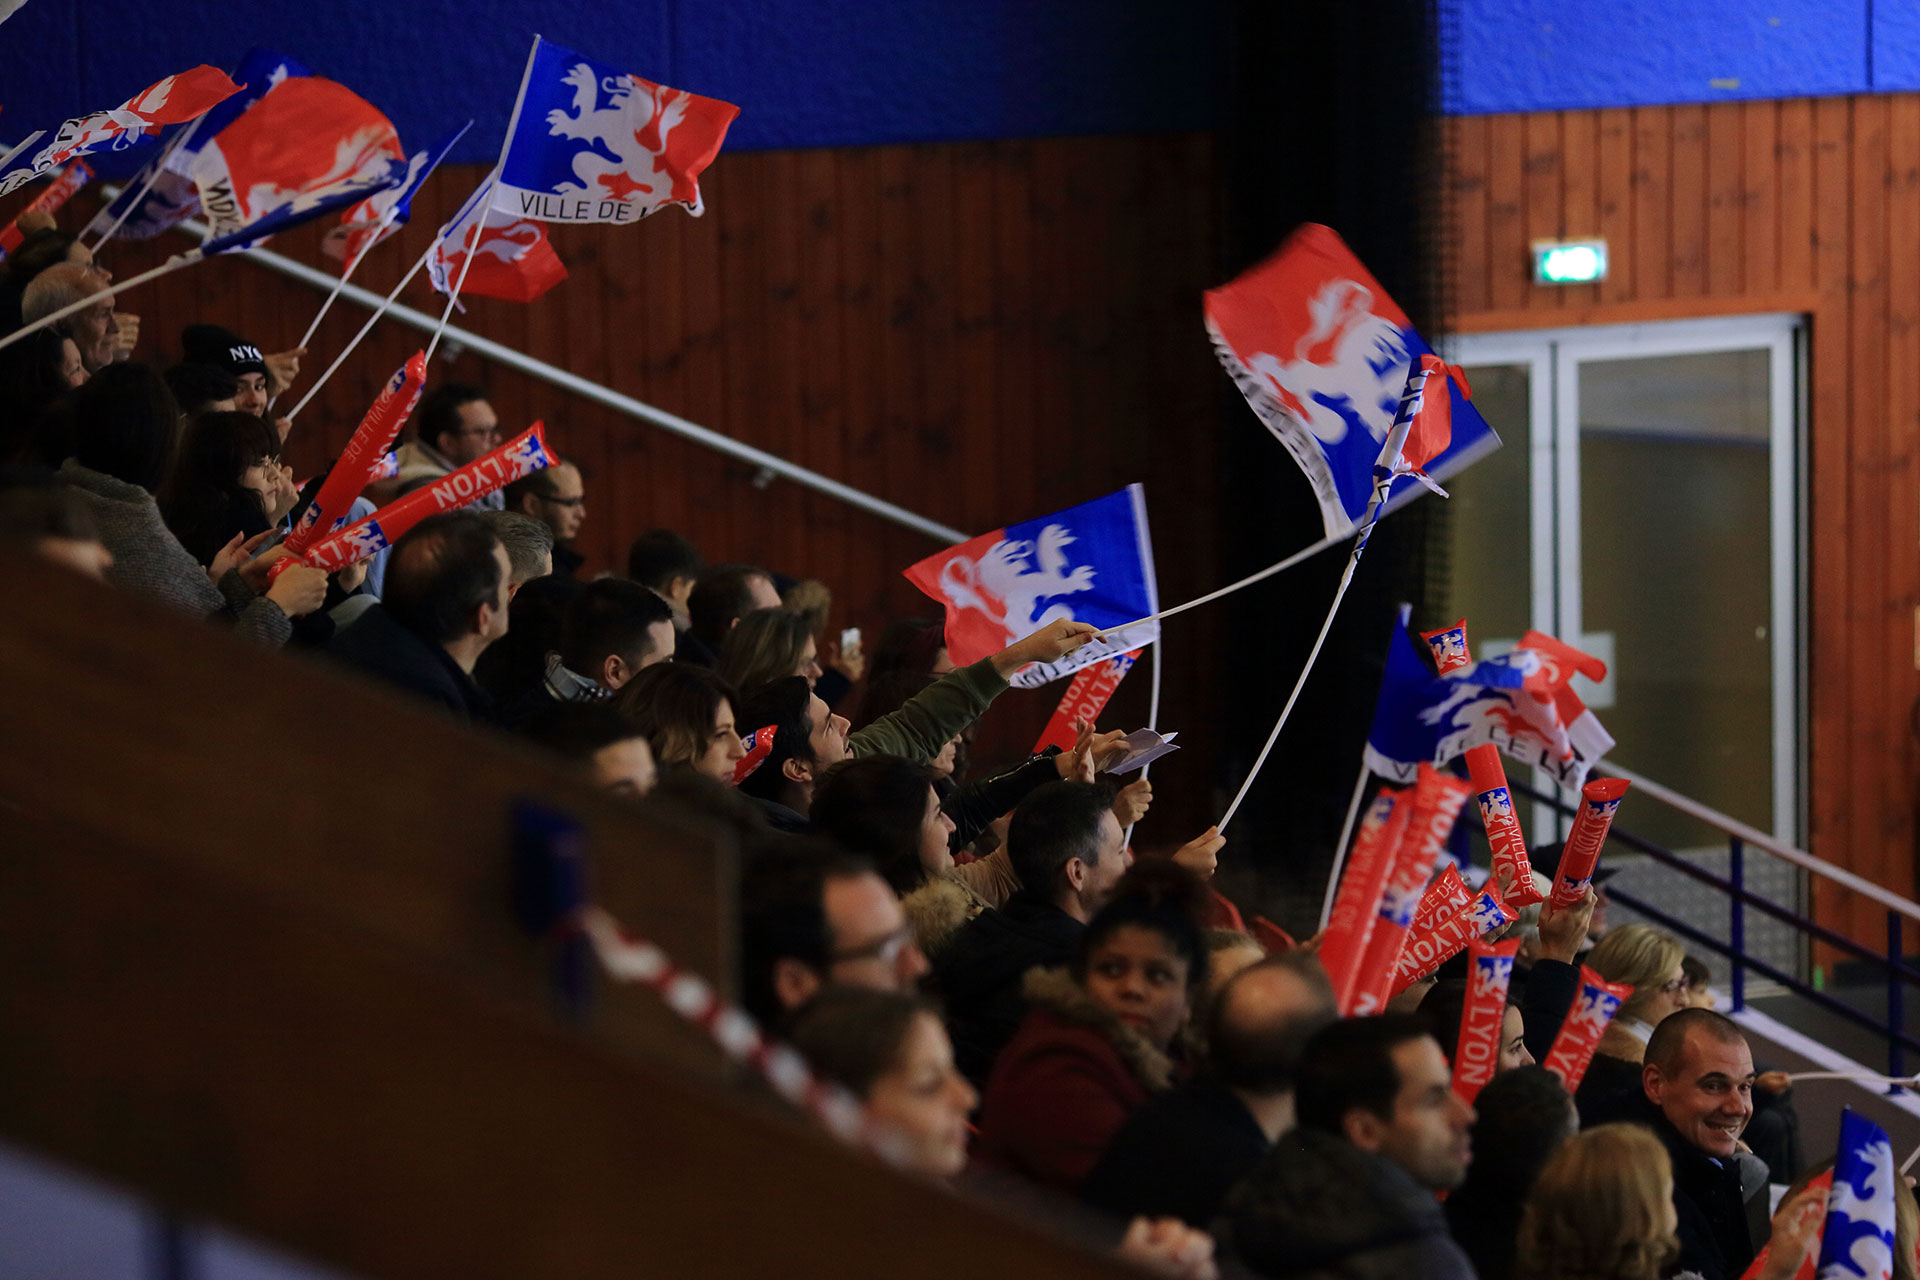 Supporters lyon hockey